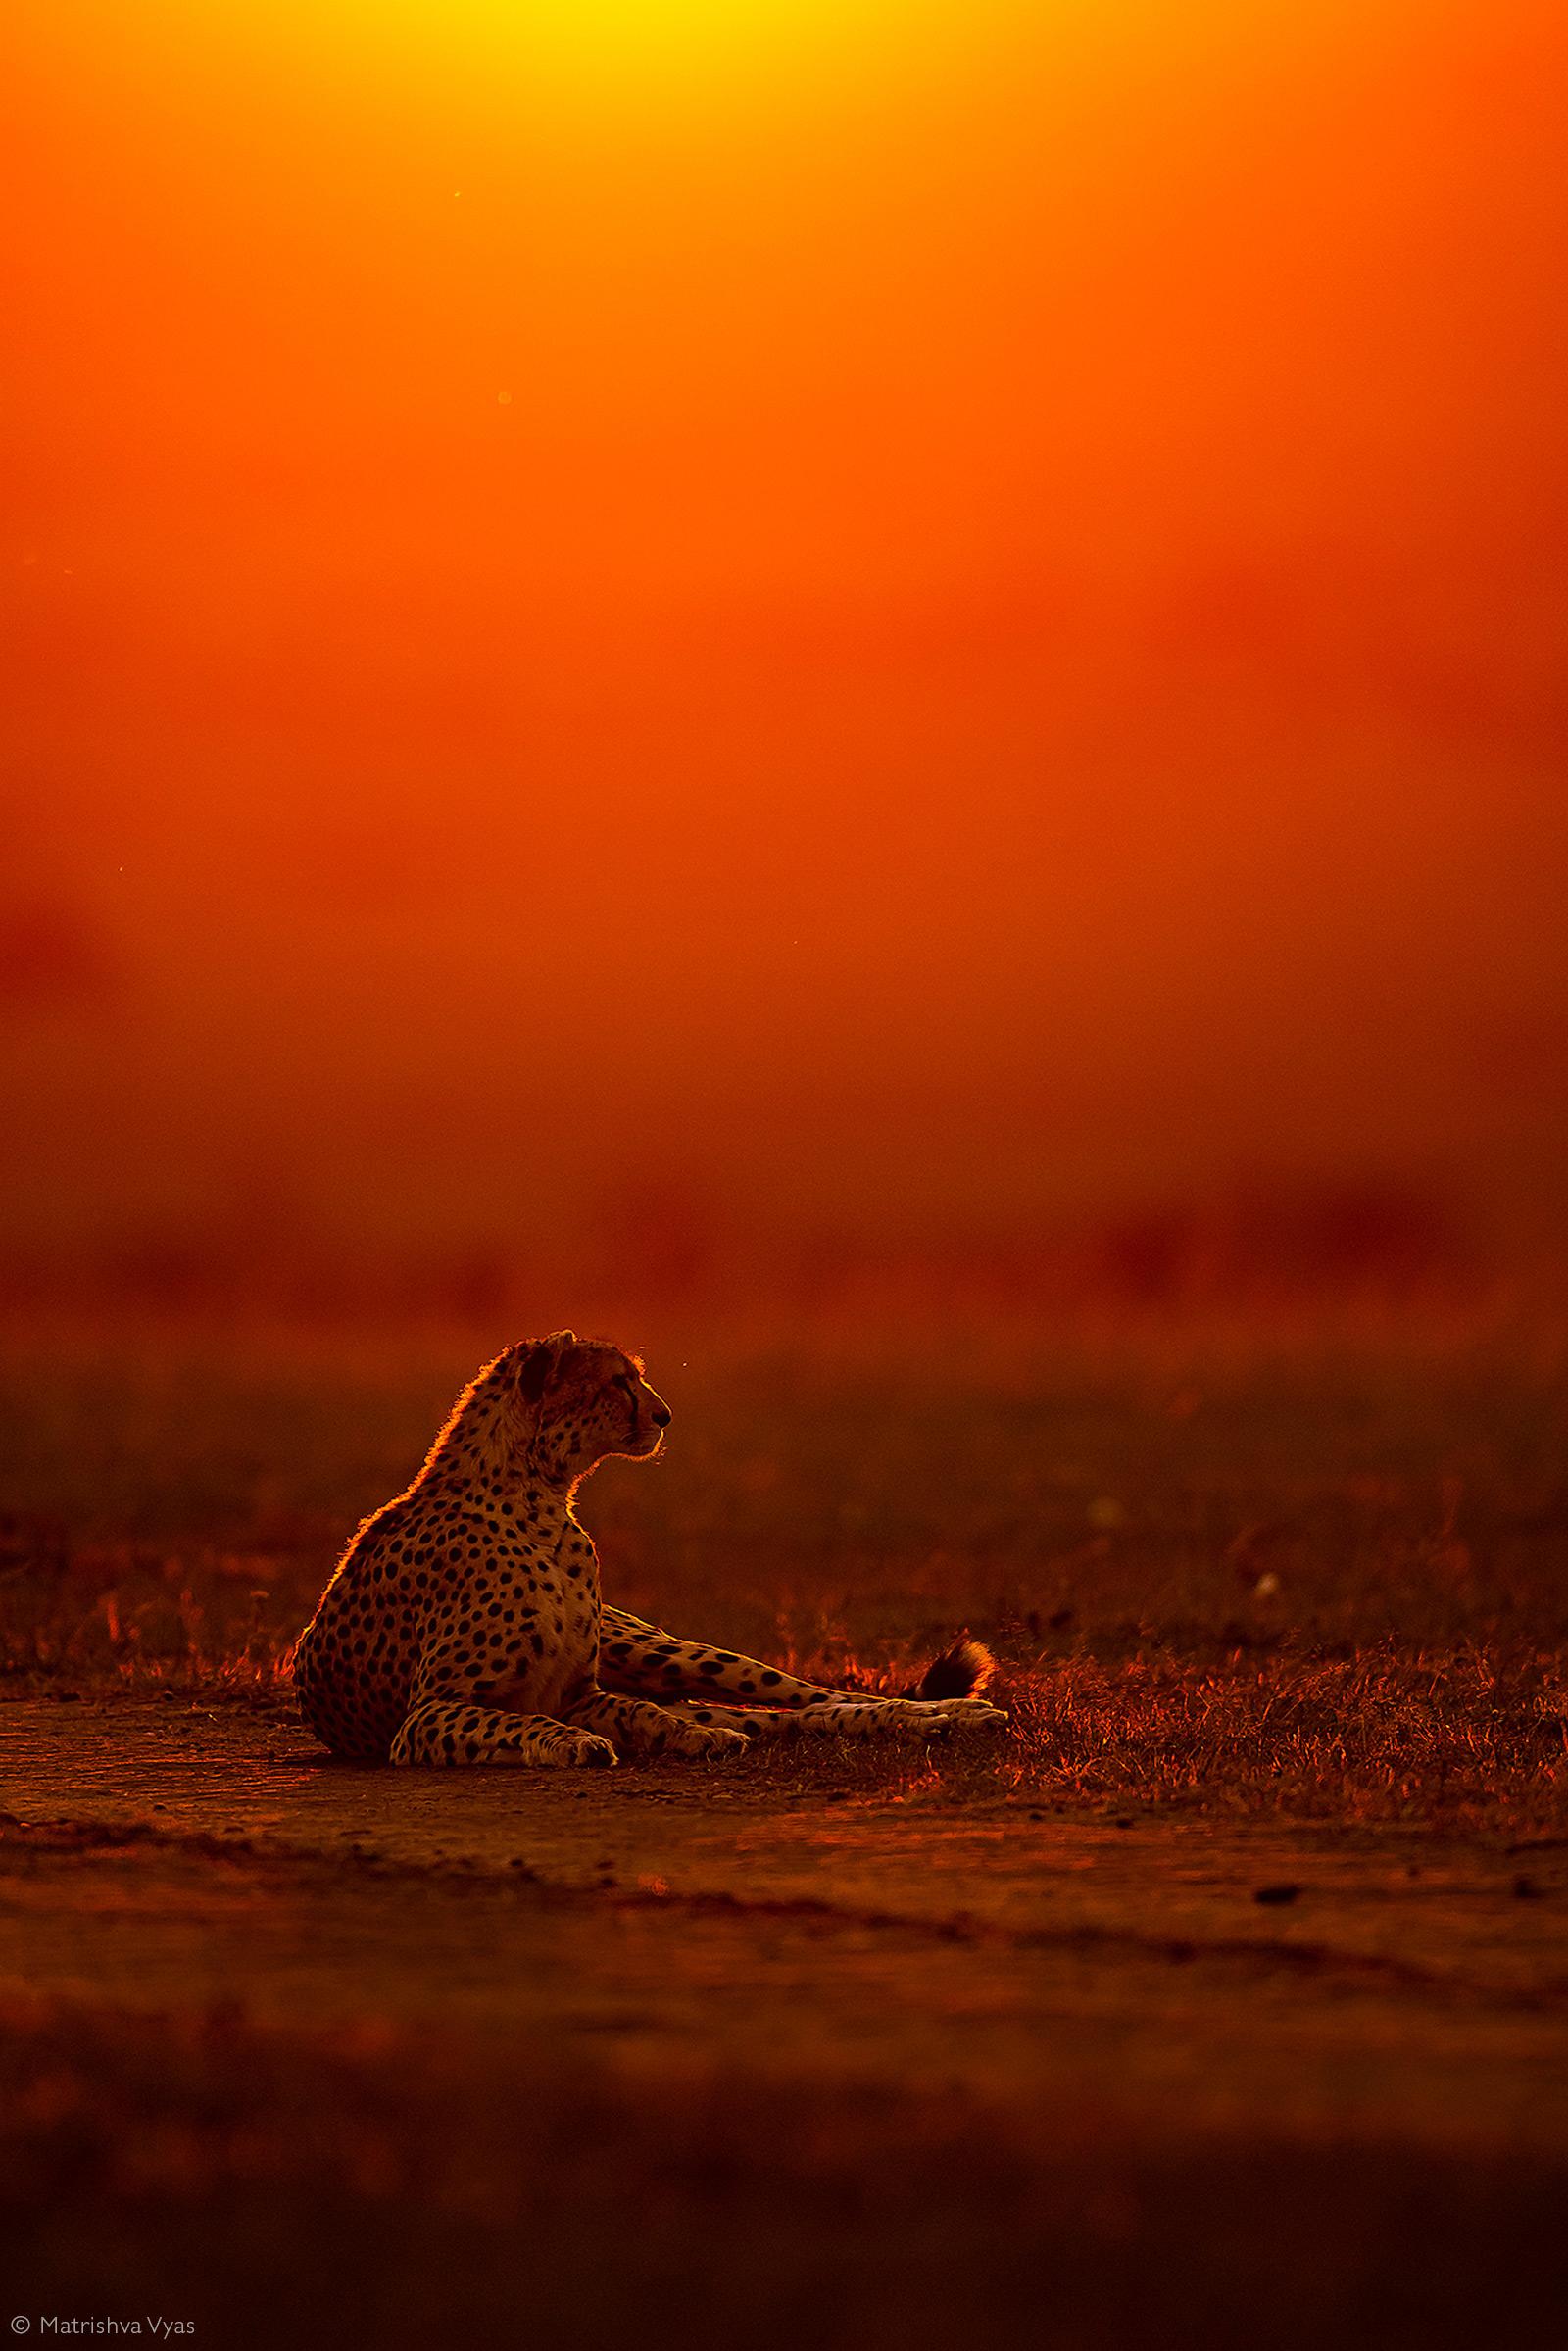 Cheetah photographed against the evening sky. Maasai Mara National Reserve, Kenya © Matrishva Vyas